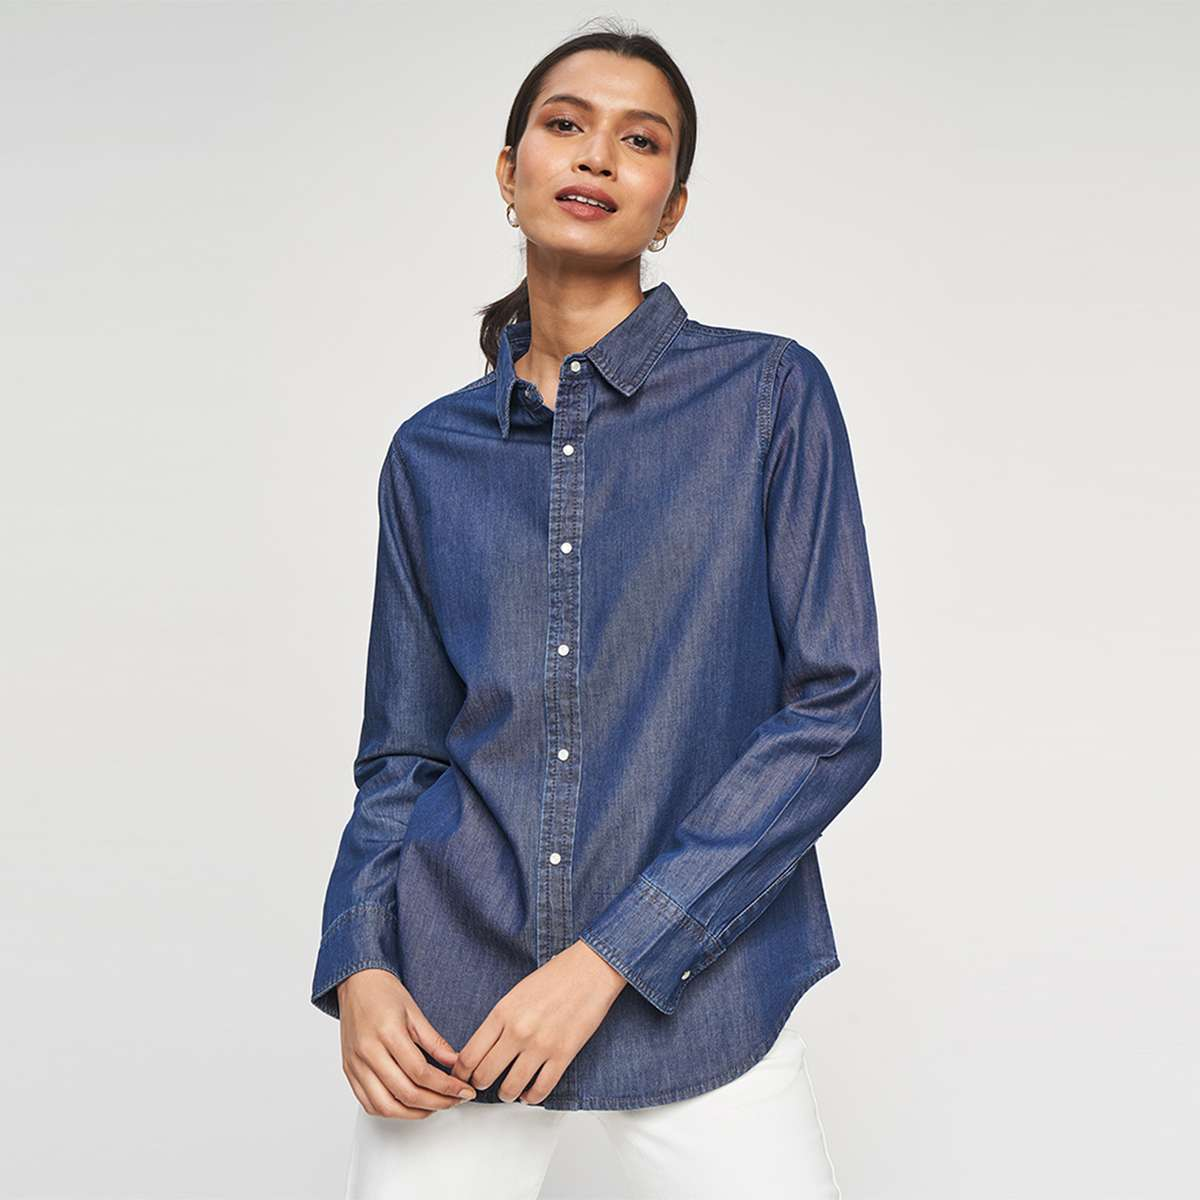 2.AND Women Shimmery Denim Shirt